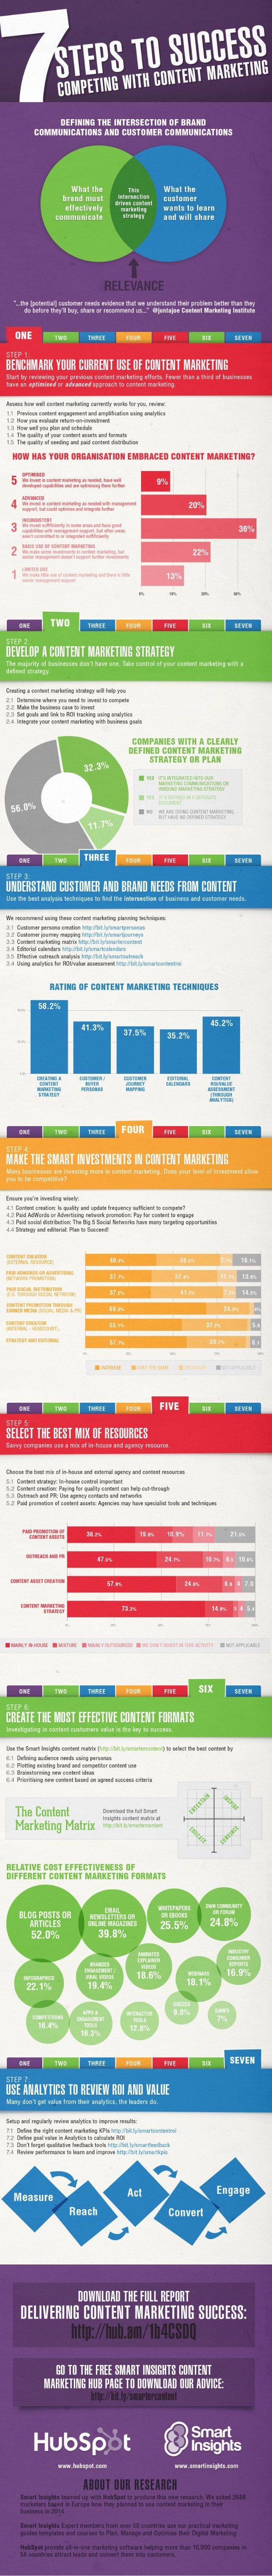 Managing content marketing infographic